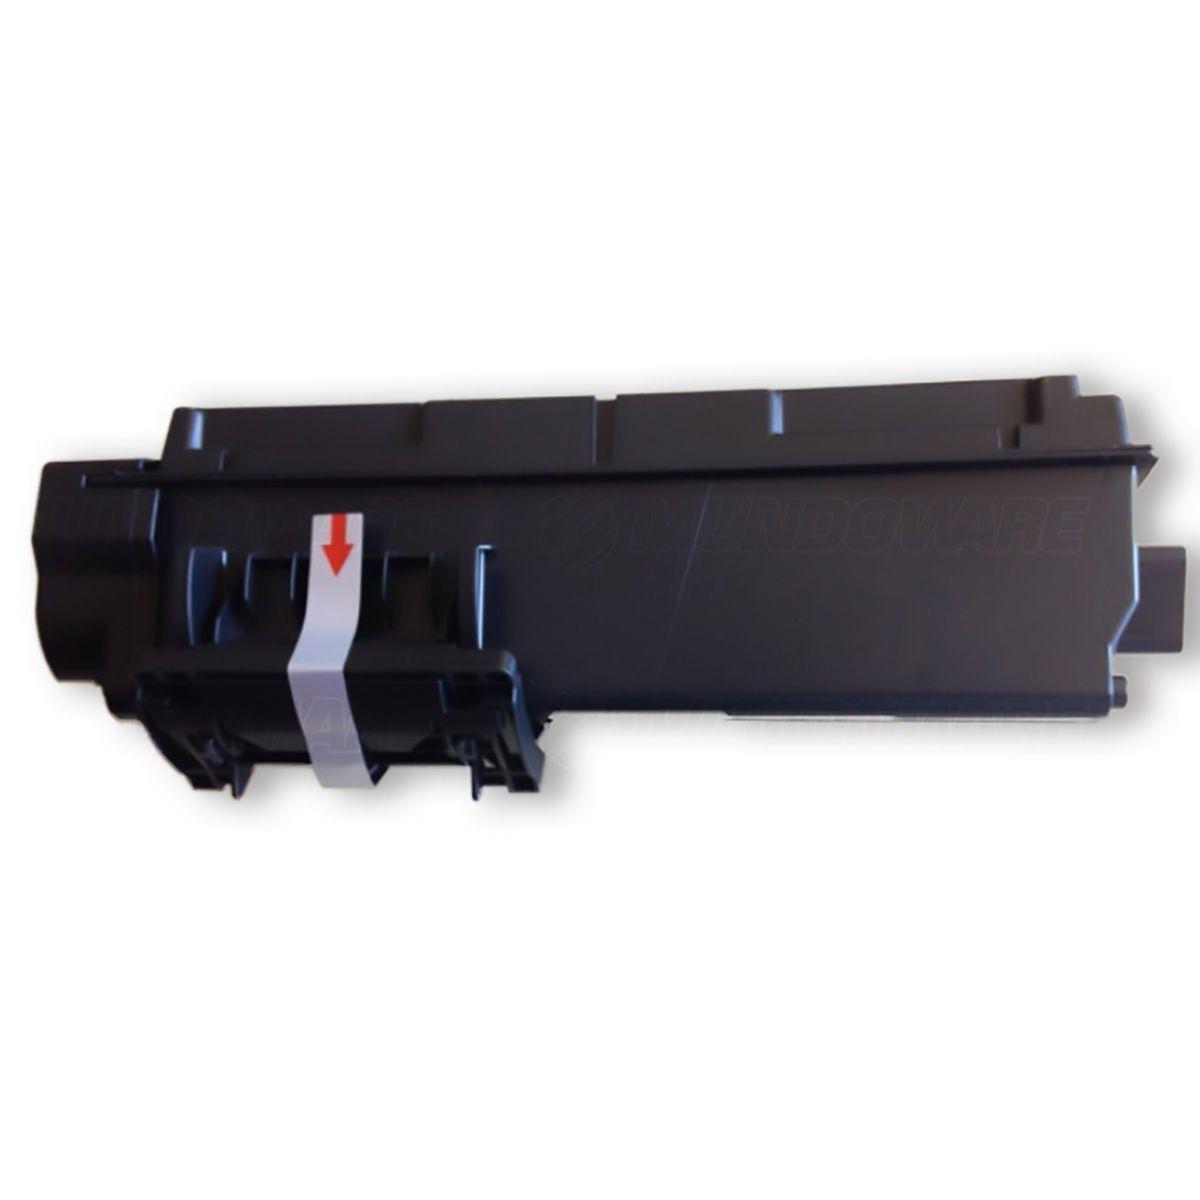 Compatível: Toner TK1175 TK1172 para Kyocera Ecosys M2040 M2540 M2640 M2040dn M2540dn M2640idw / Preto / 12.000